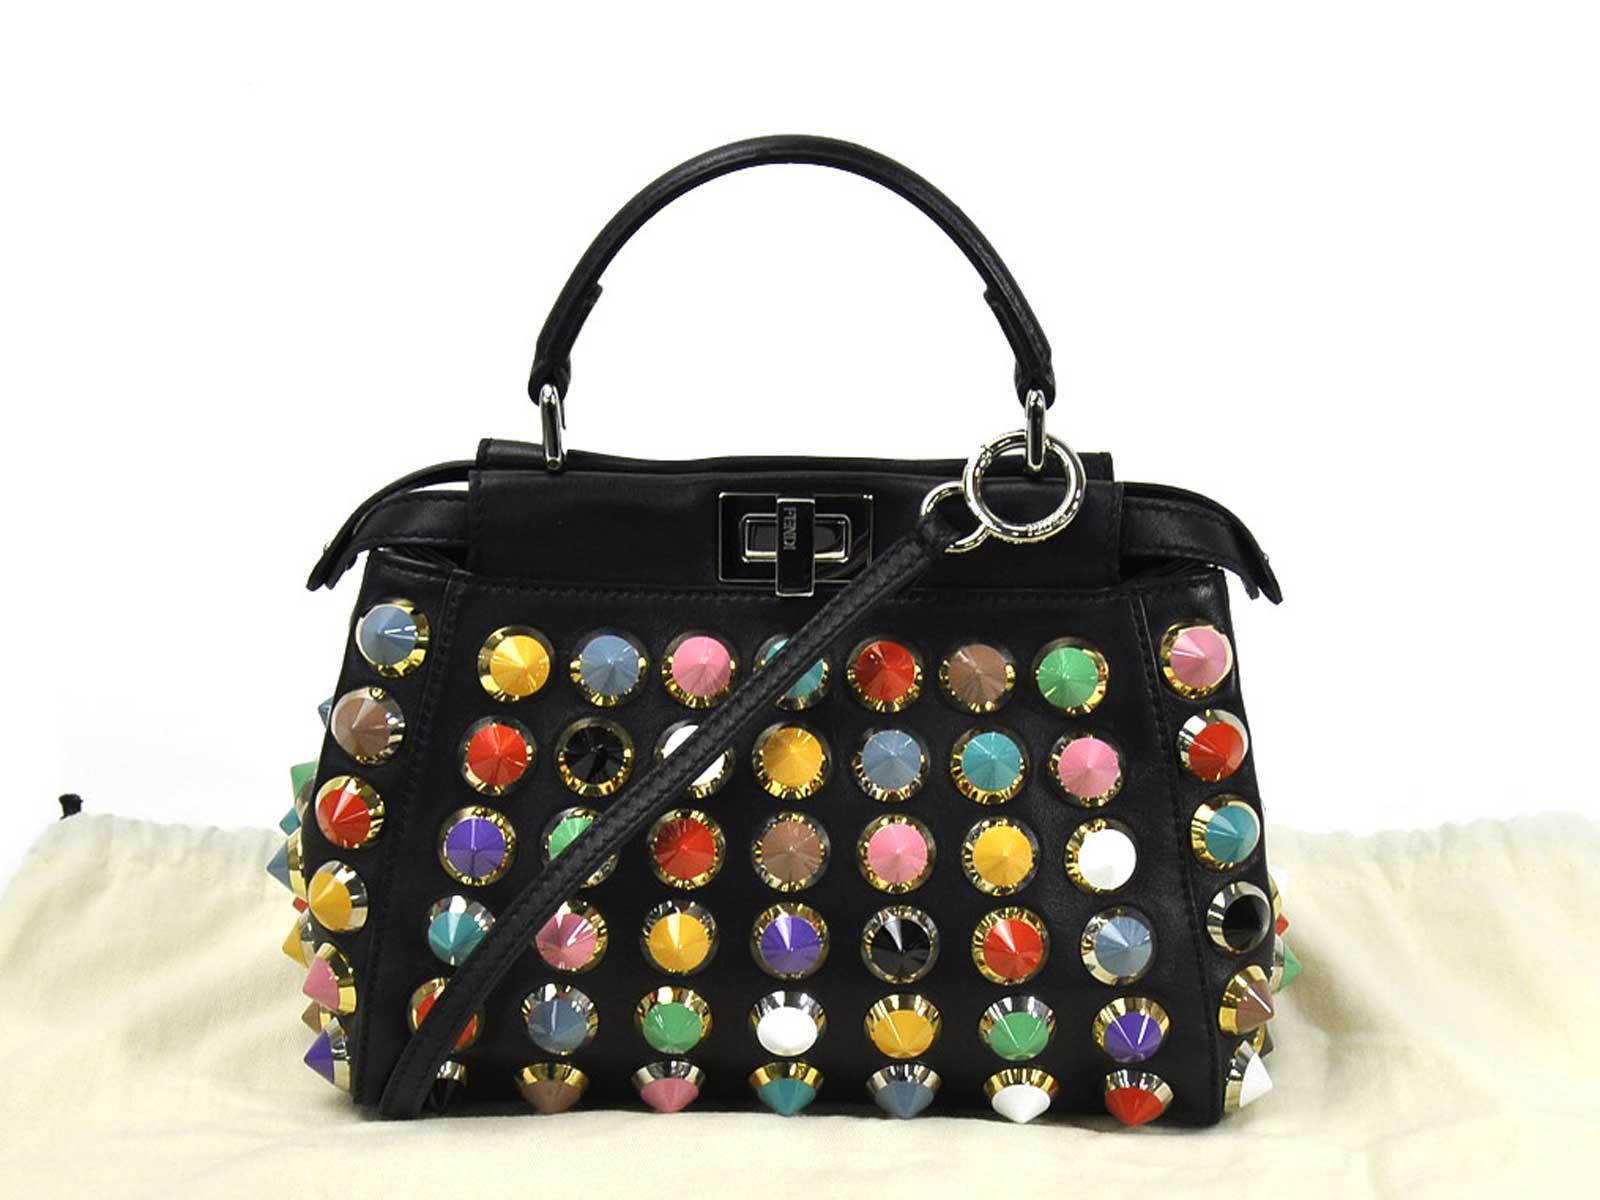 06b58ccd7c Auth FENDI Studded Peekaboo Mini Handbag Shoulder Bag Black ...